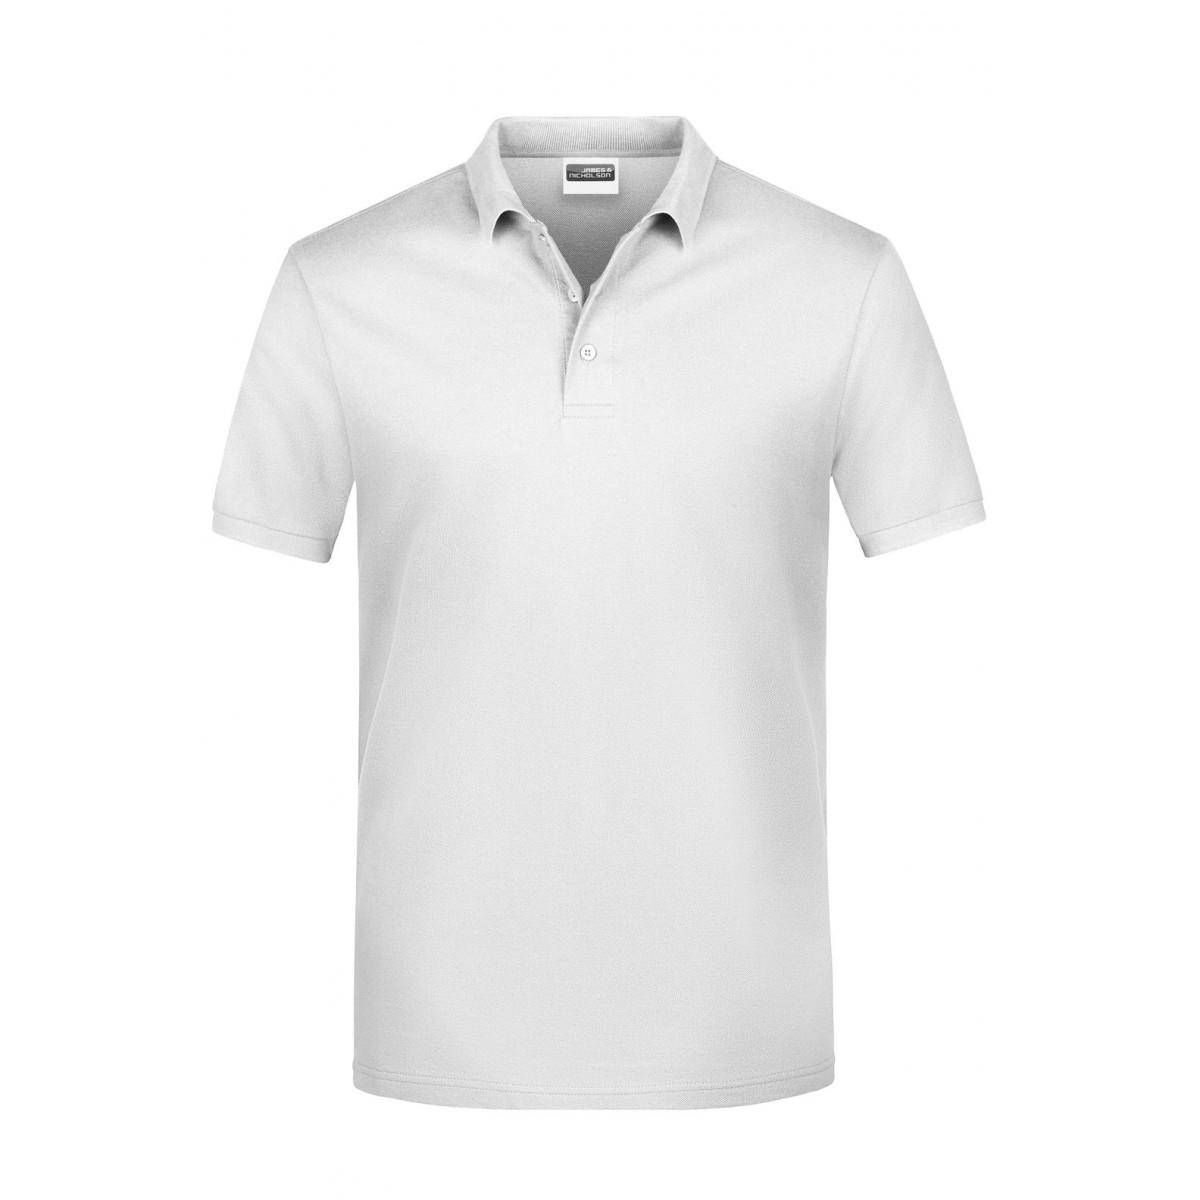 Рубашка поло мужская JN792 Basic Polo Man - Белый